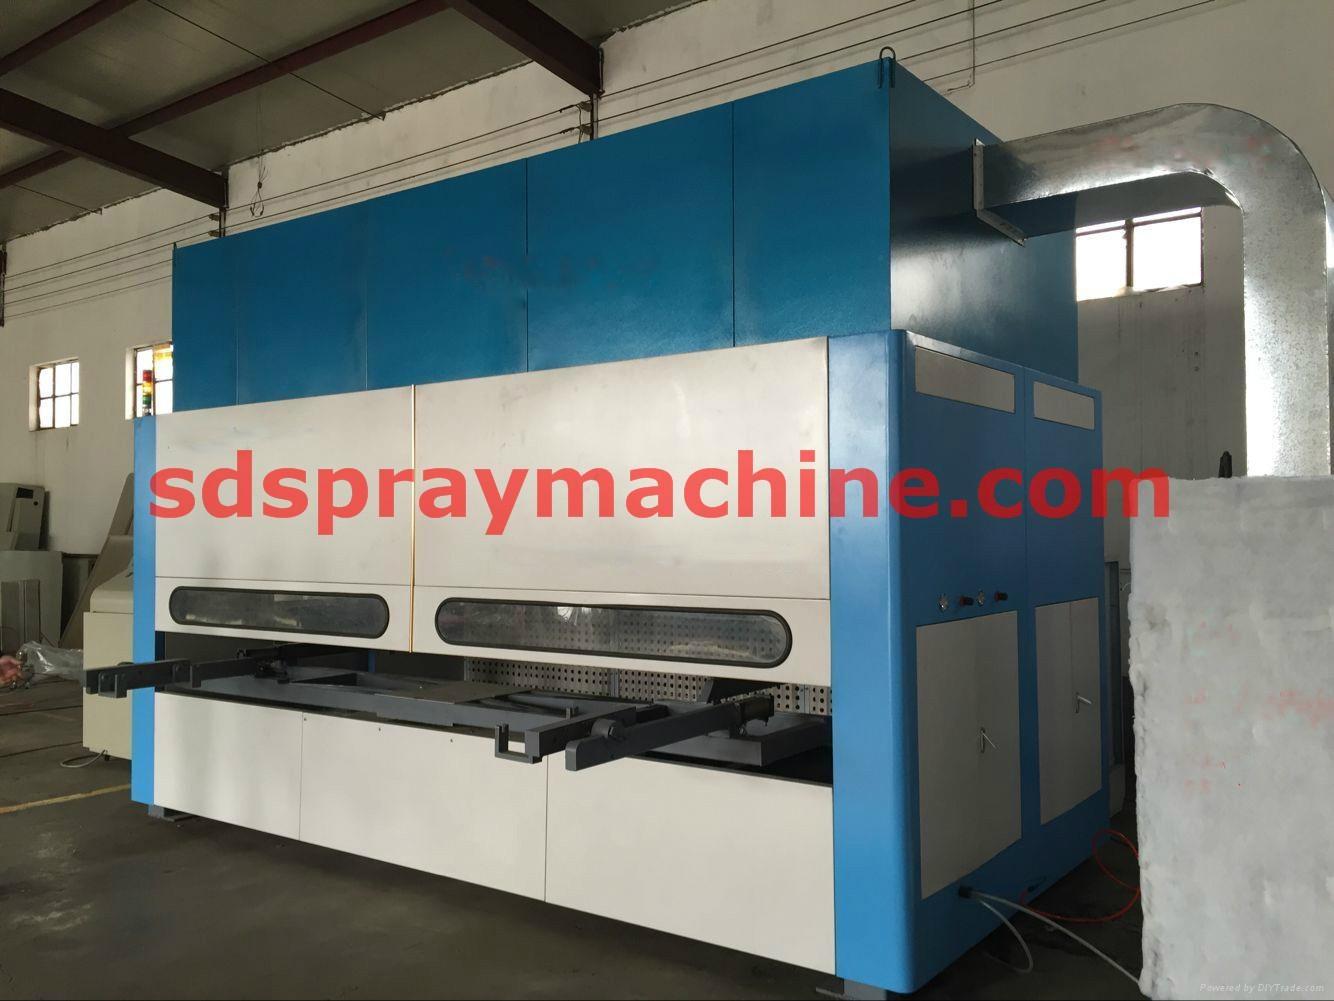 Automatic Spray Machine for windows & Doors 1